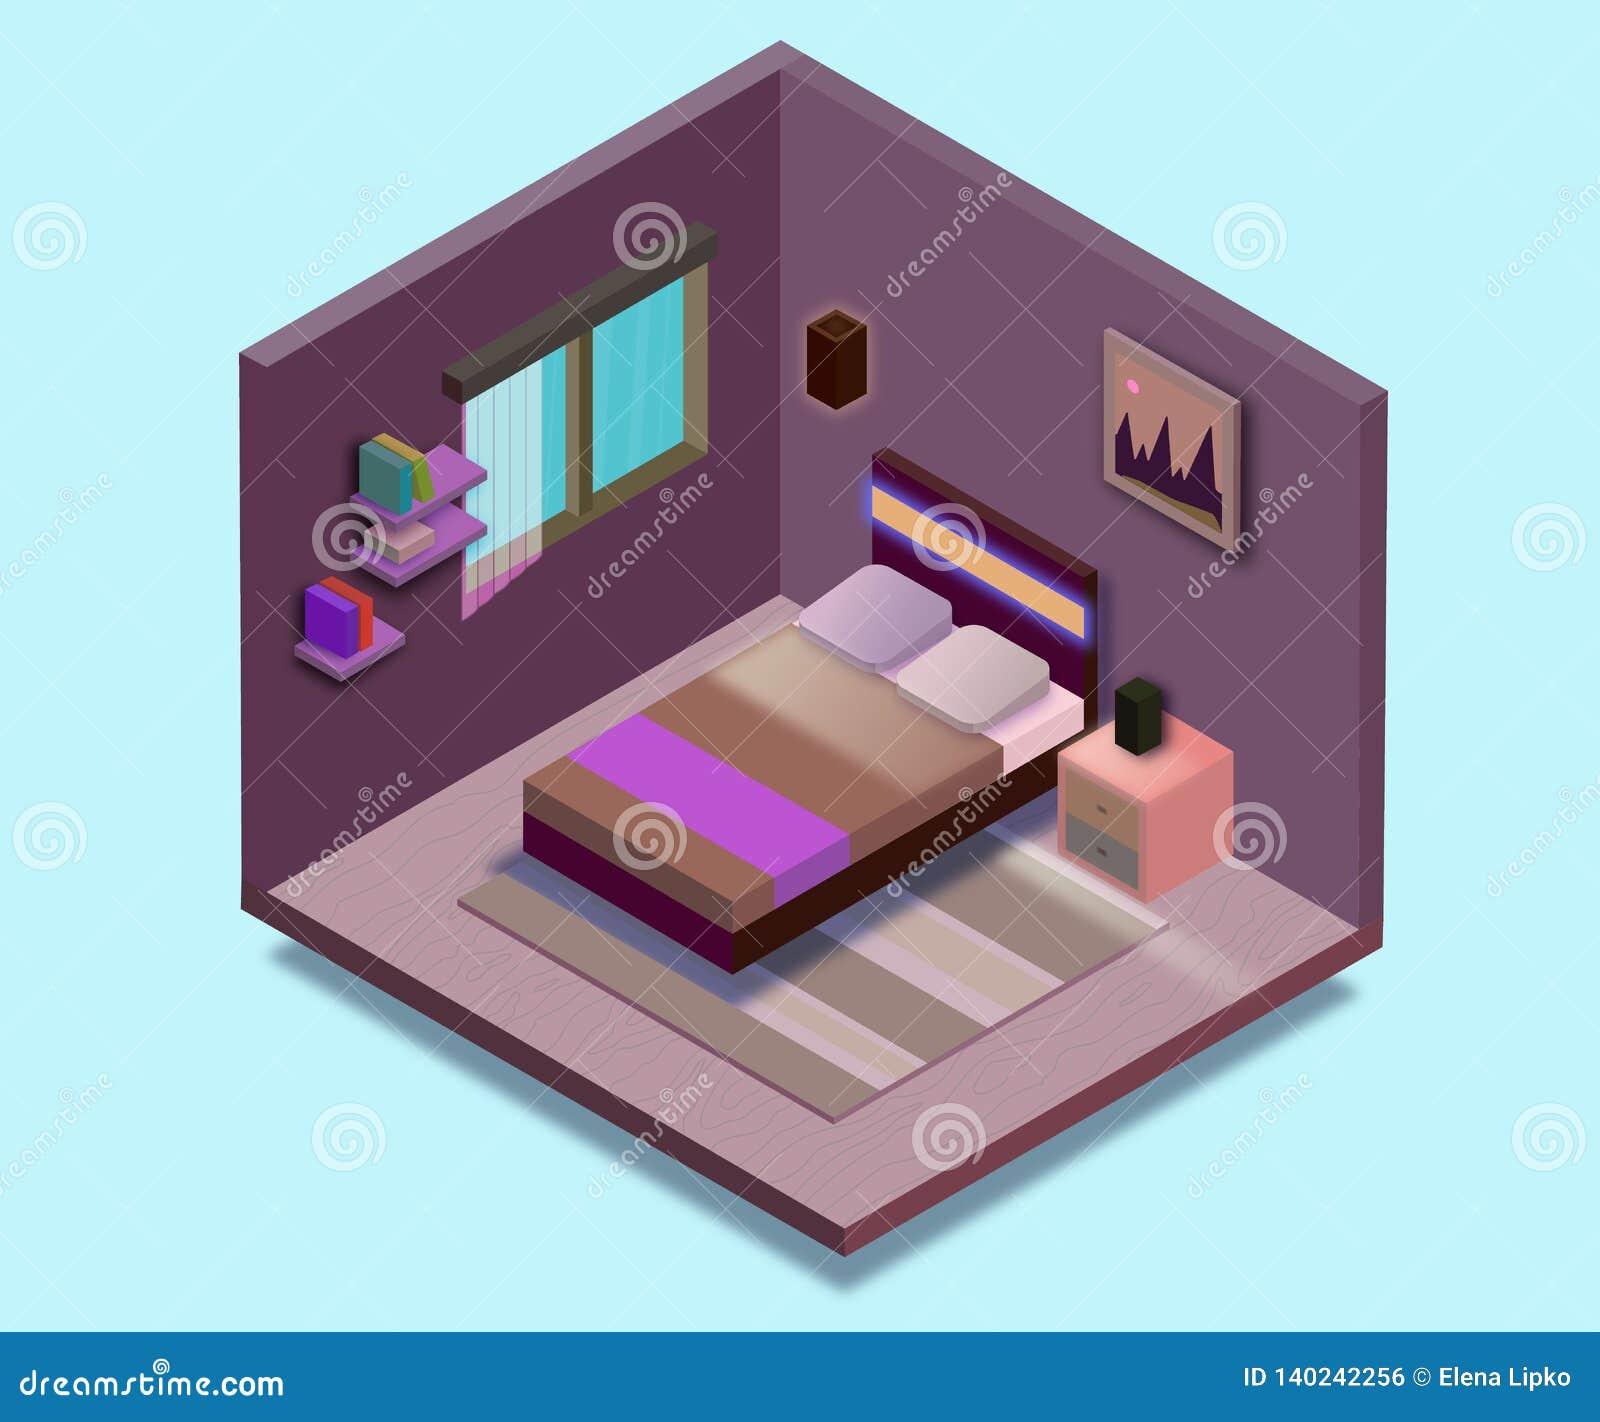 Isometric Bedroom Illustration Vector Flat Illustration Stock Vector Illustration Of Living Room 140242256